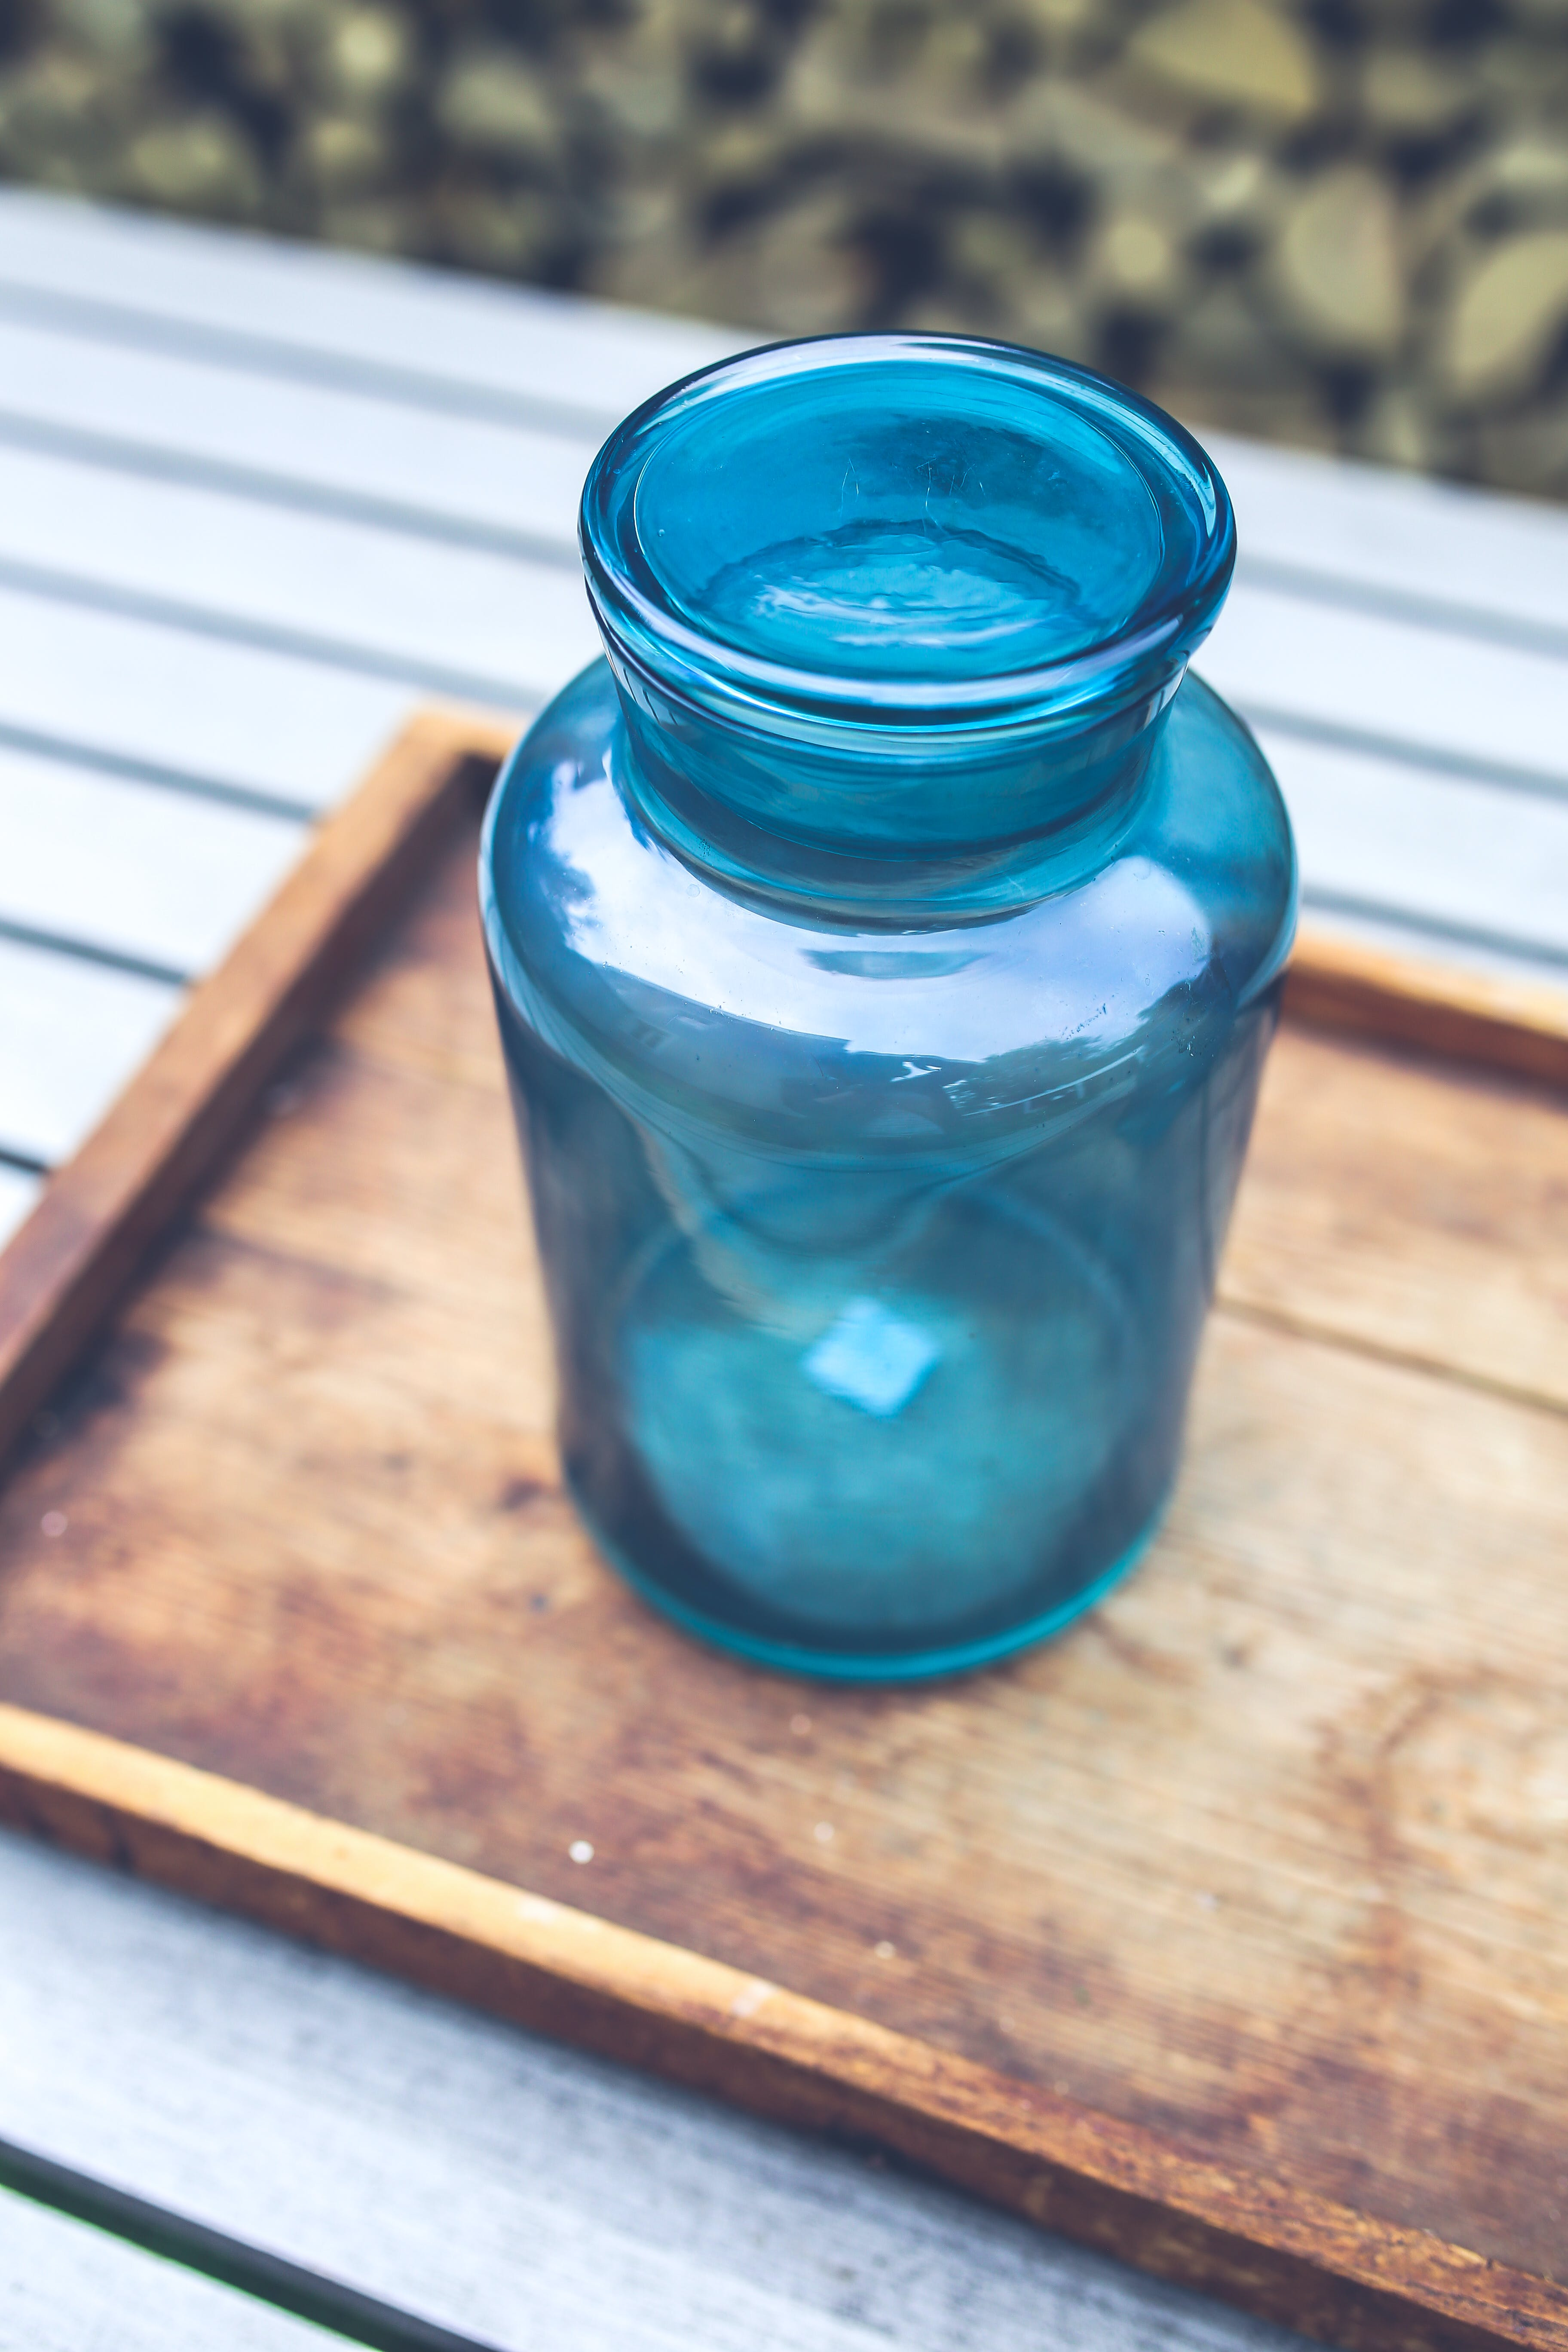 Blue jar on the tray